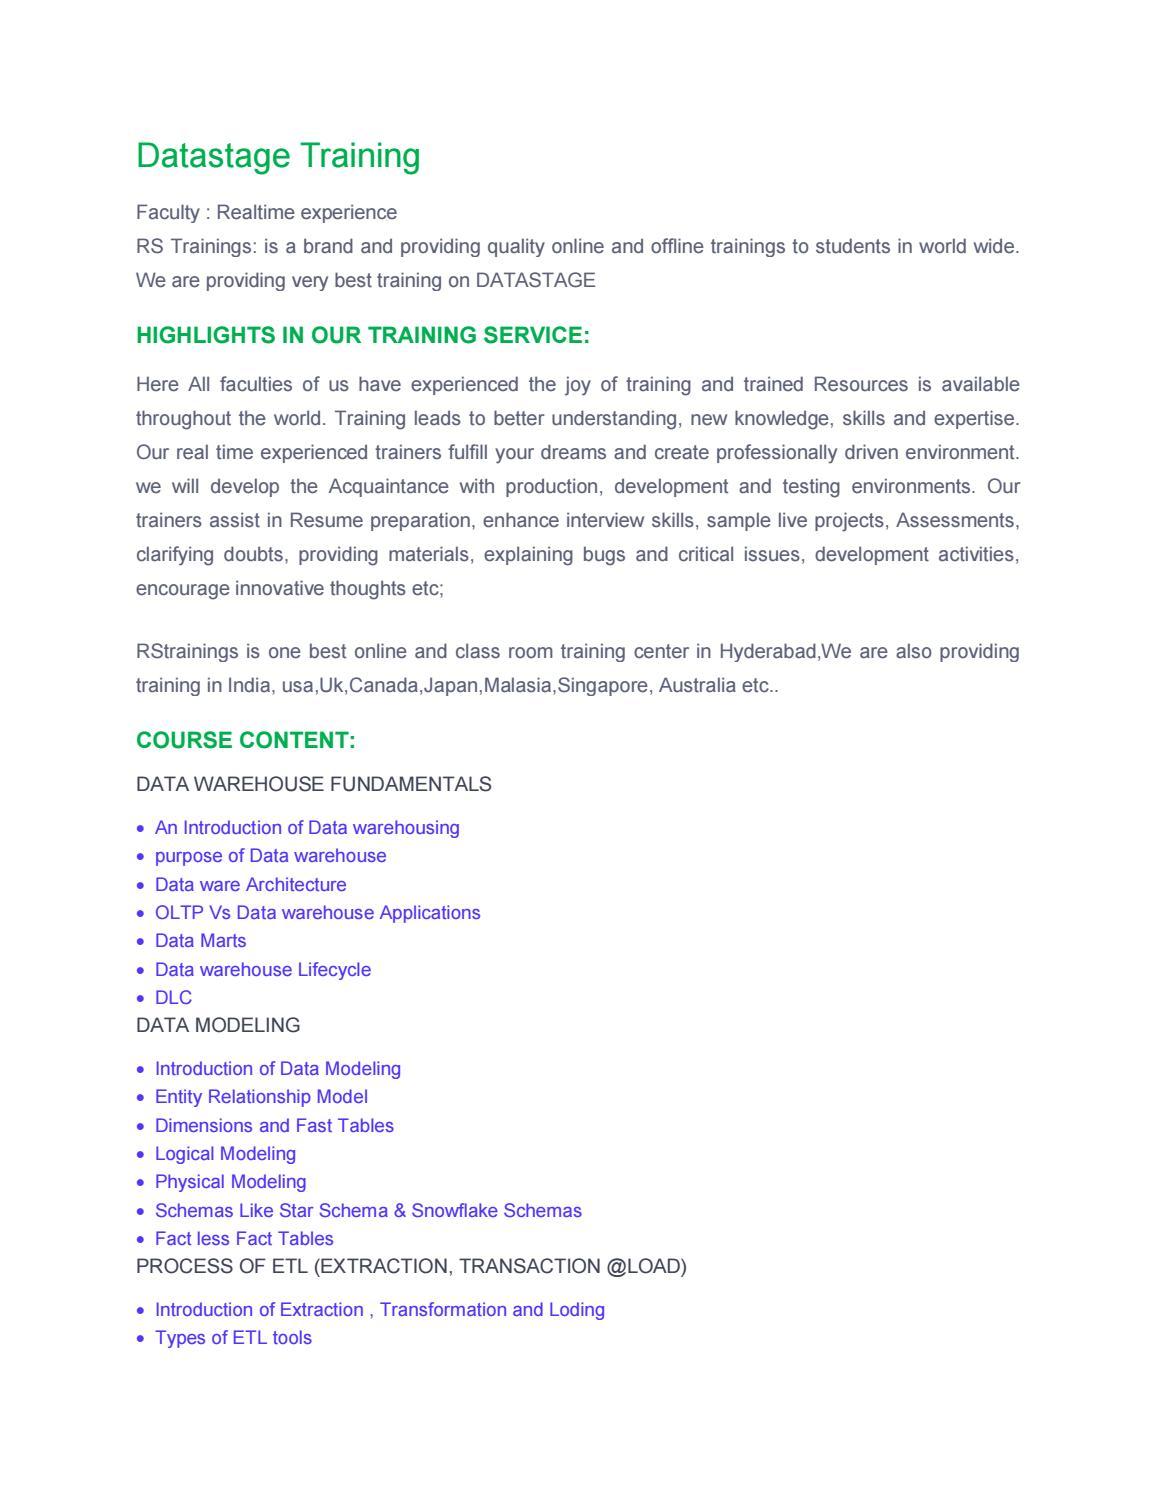 Datastage pdf file 24 08 (1) by RS Trainings - issuu